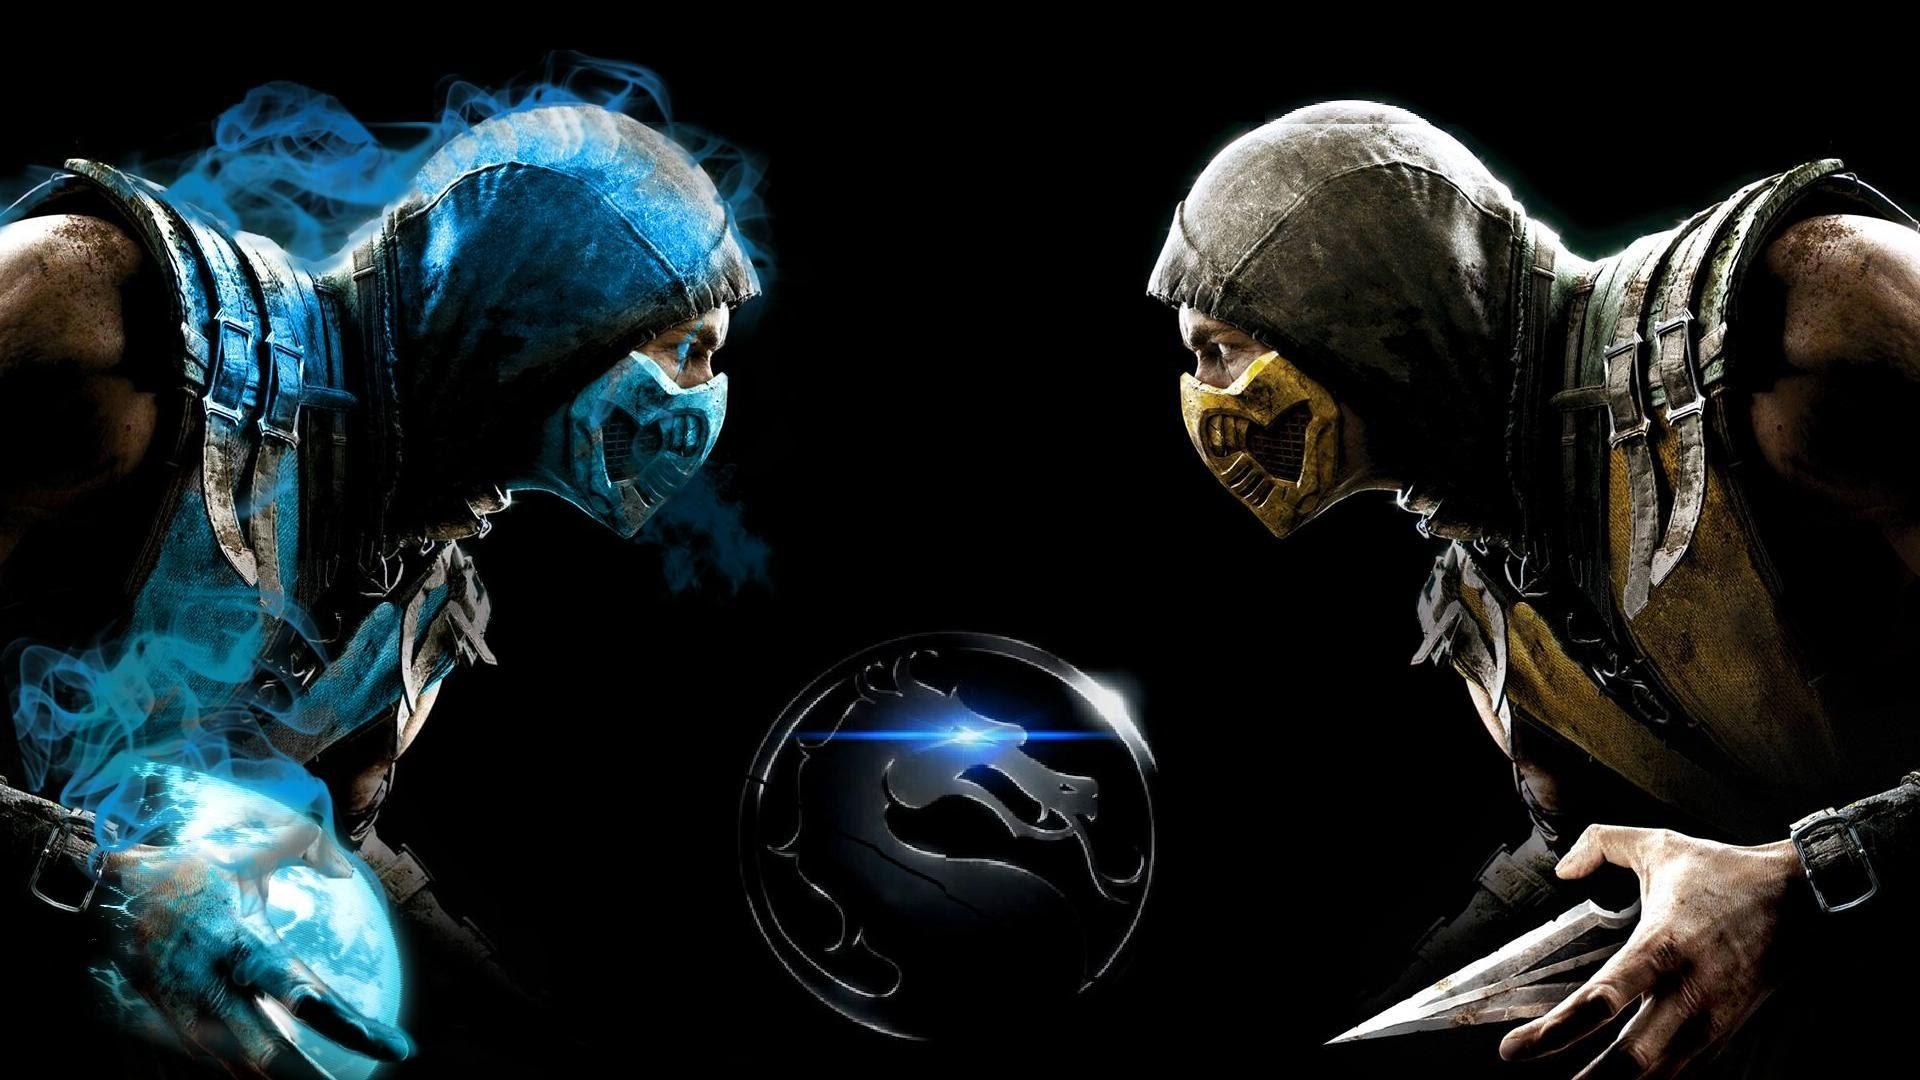 Mortal Kombat Scorpion Wallpaper 66 Pictures